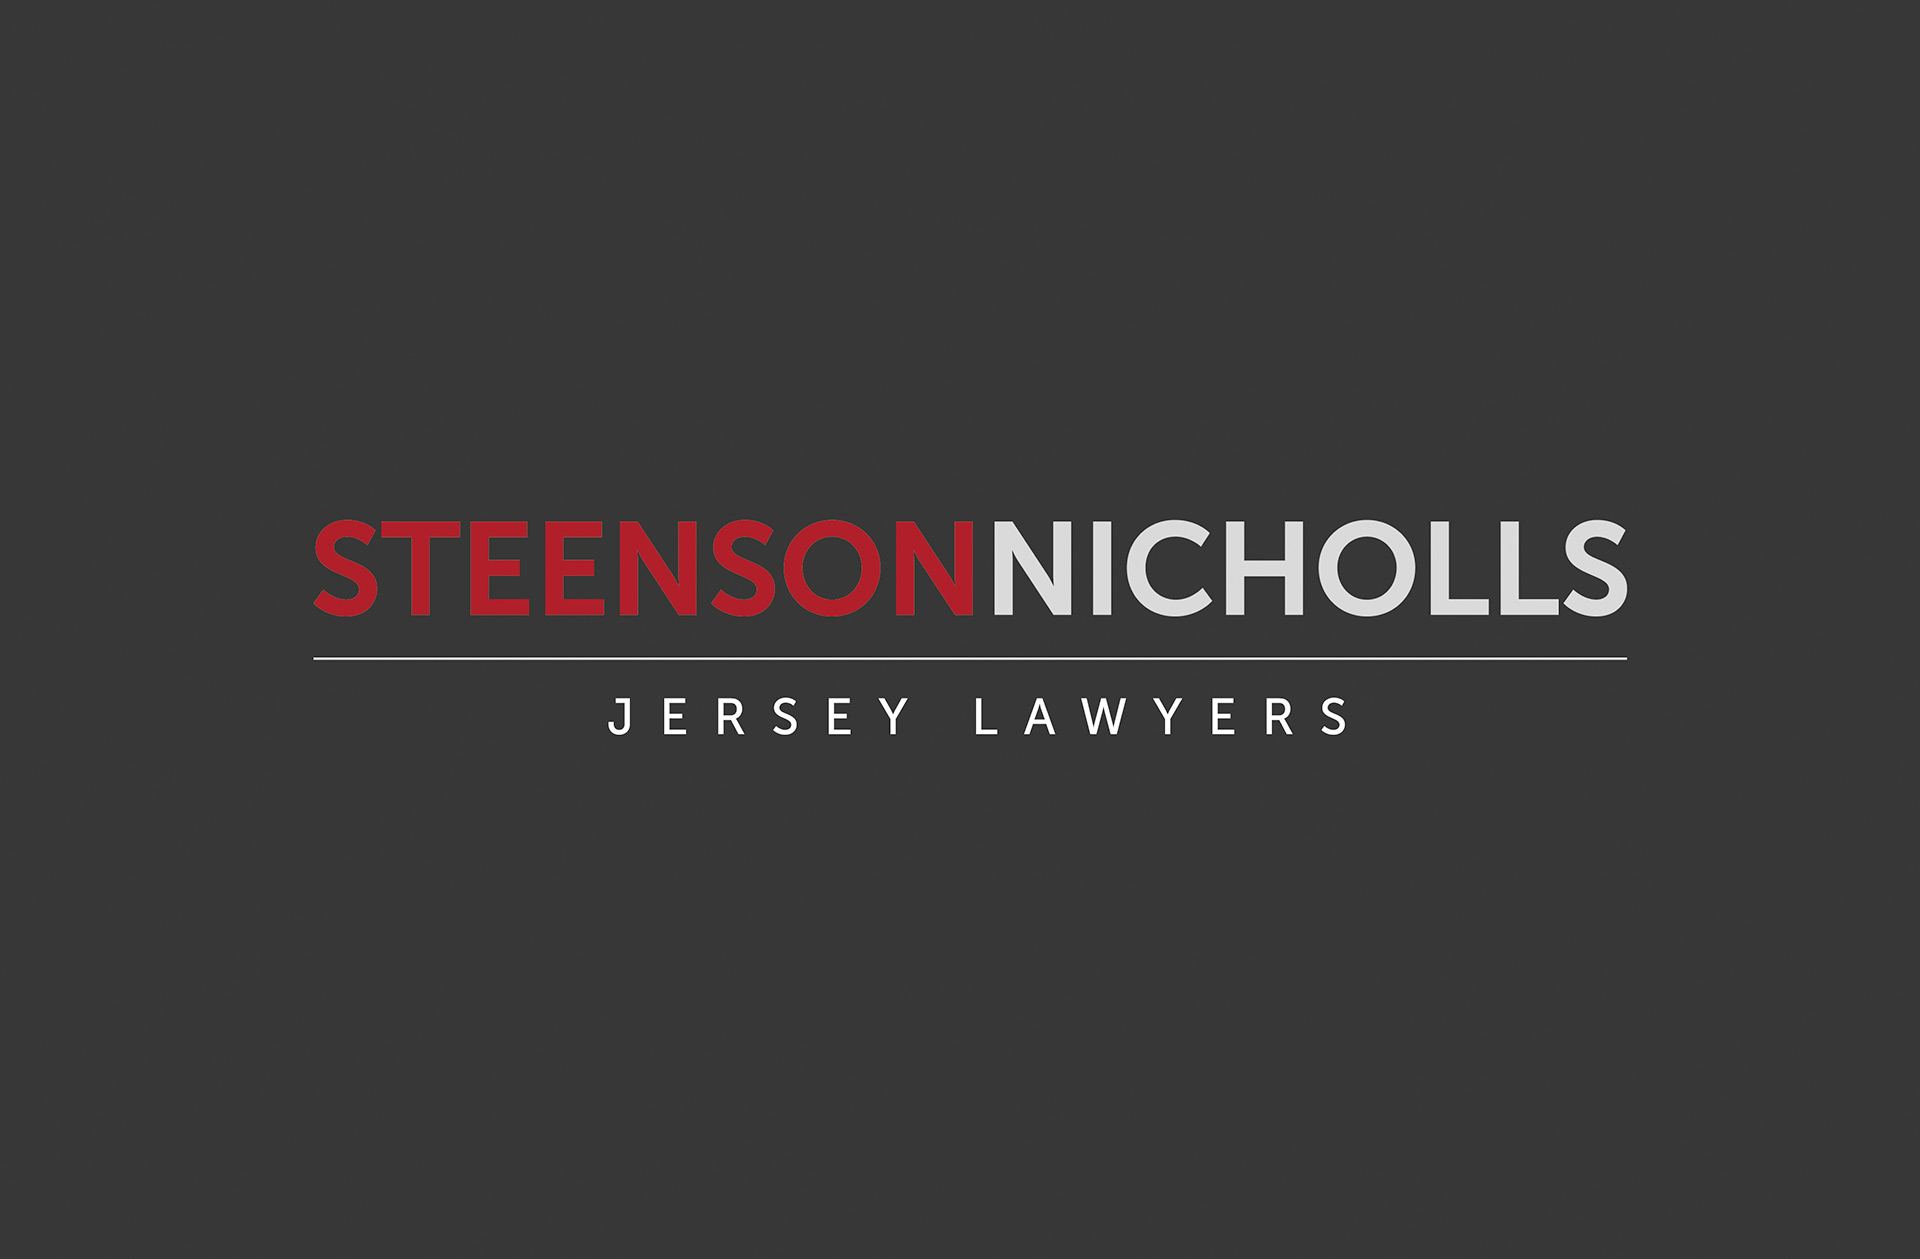 https://steensonnicholls.com/wp-content/uploads/2019/02/steenson-nicholls-logo-blog-image.jpg